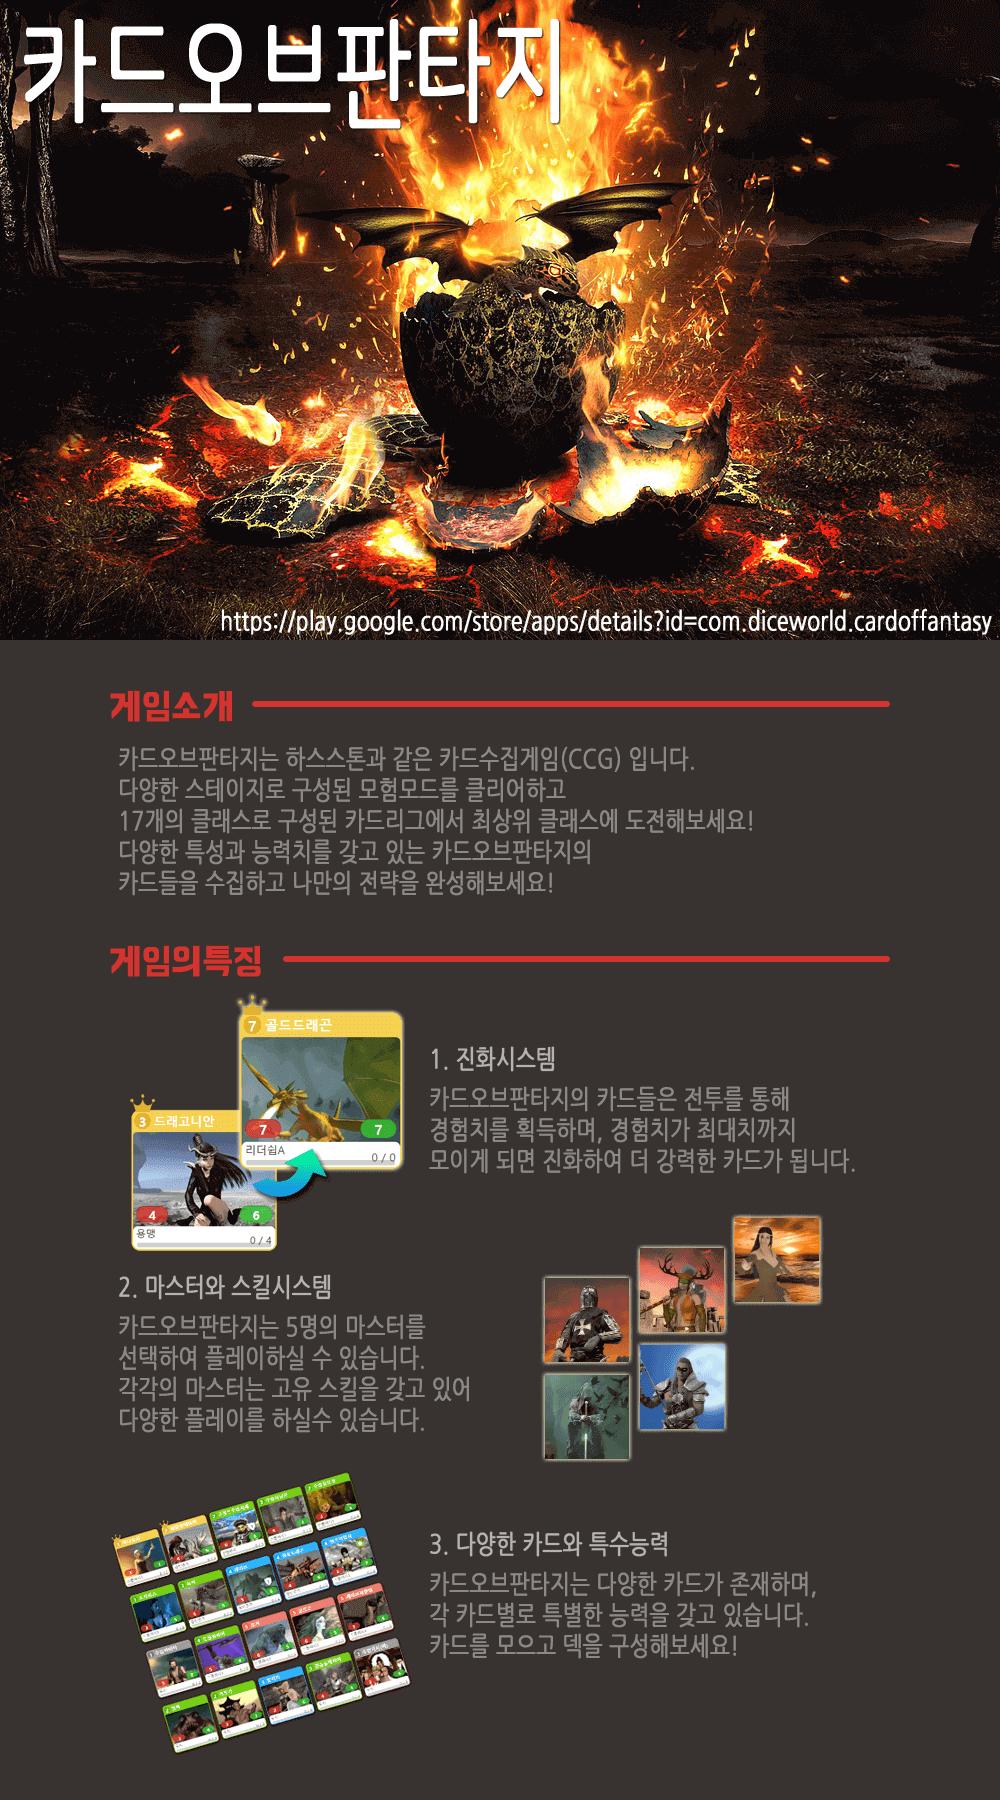 card_of_fanyasy_poster.png